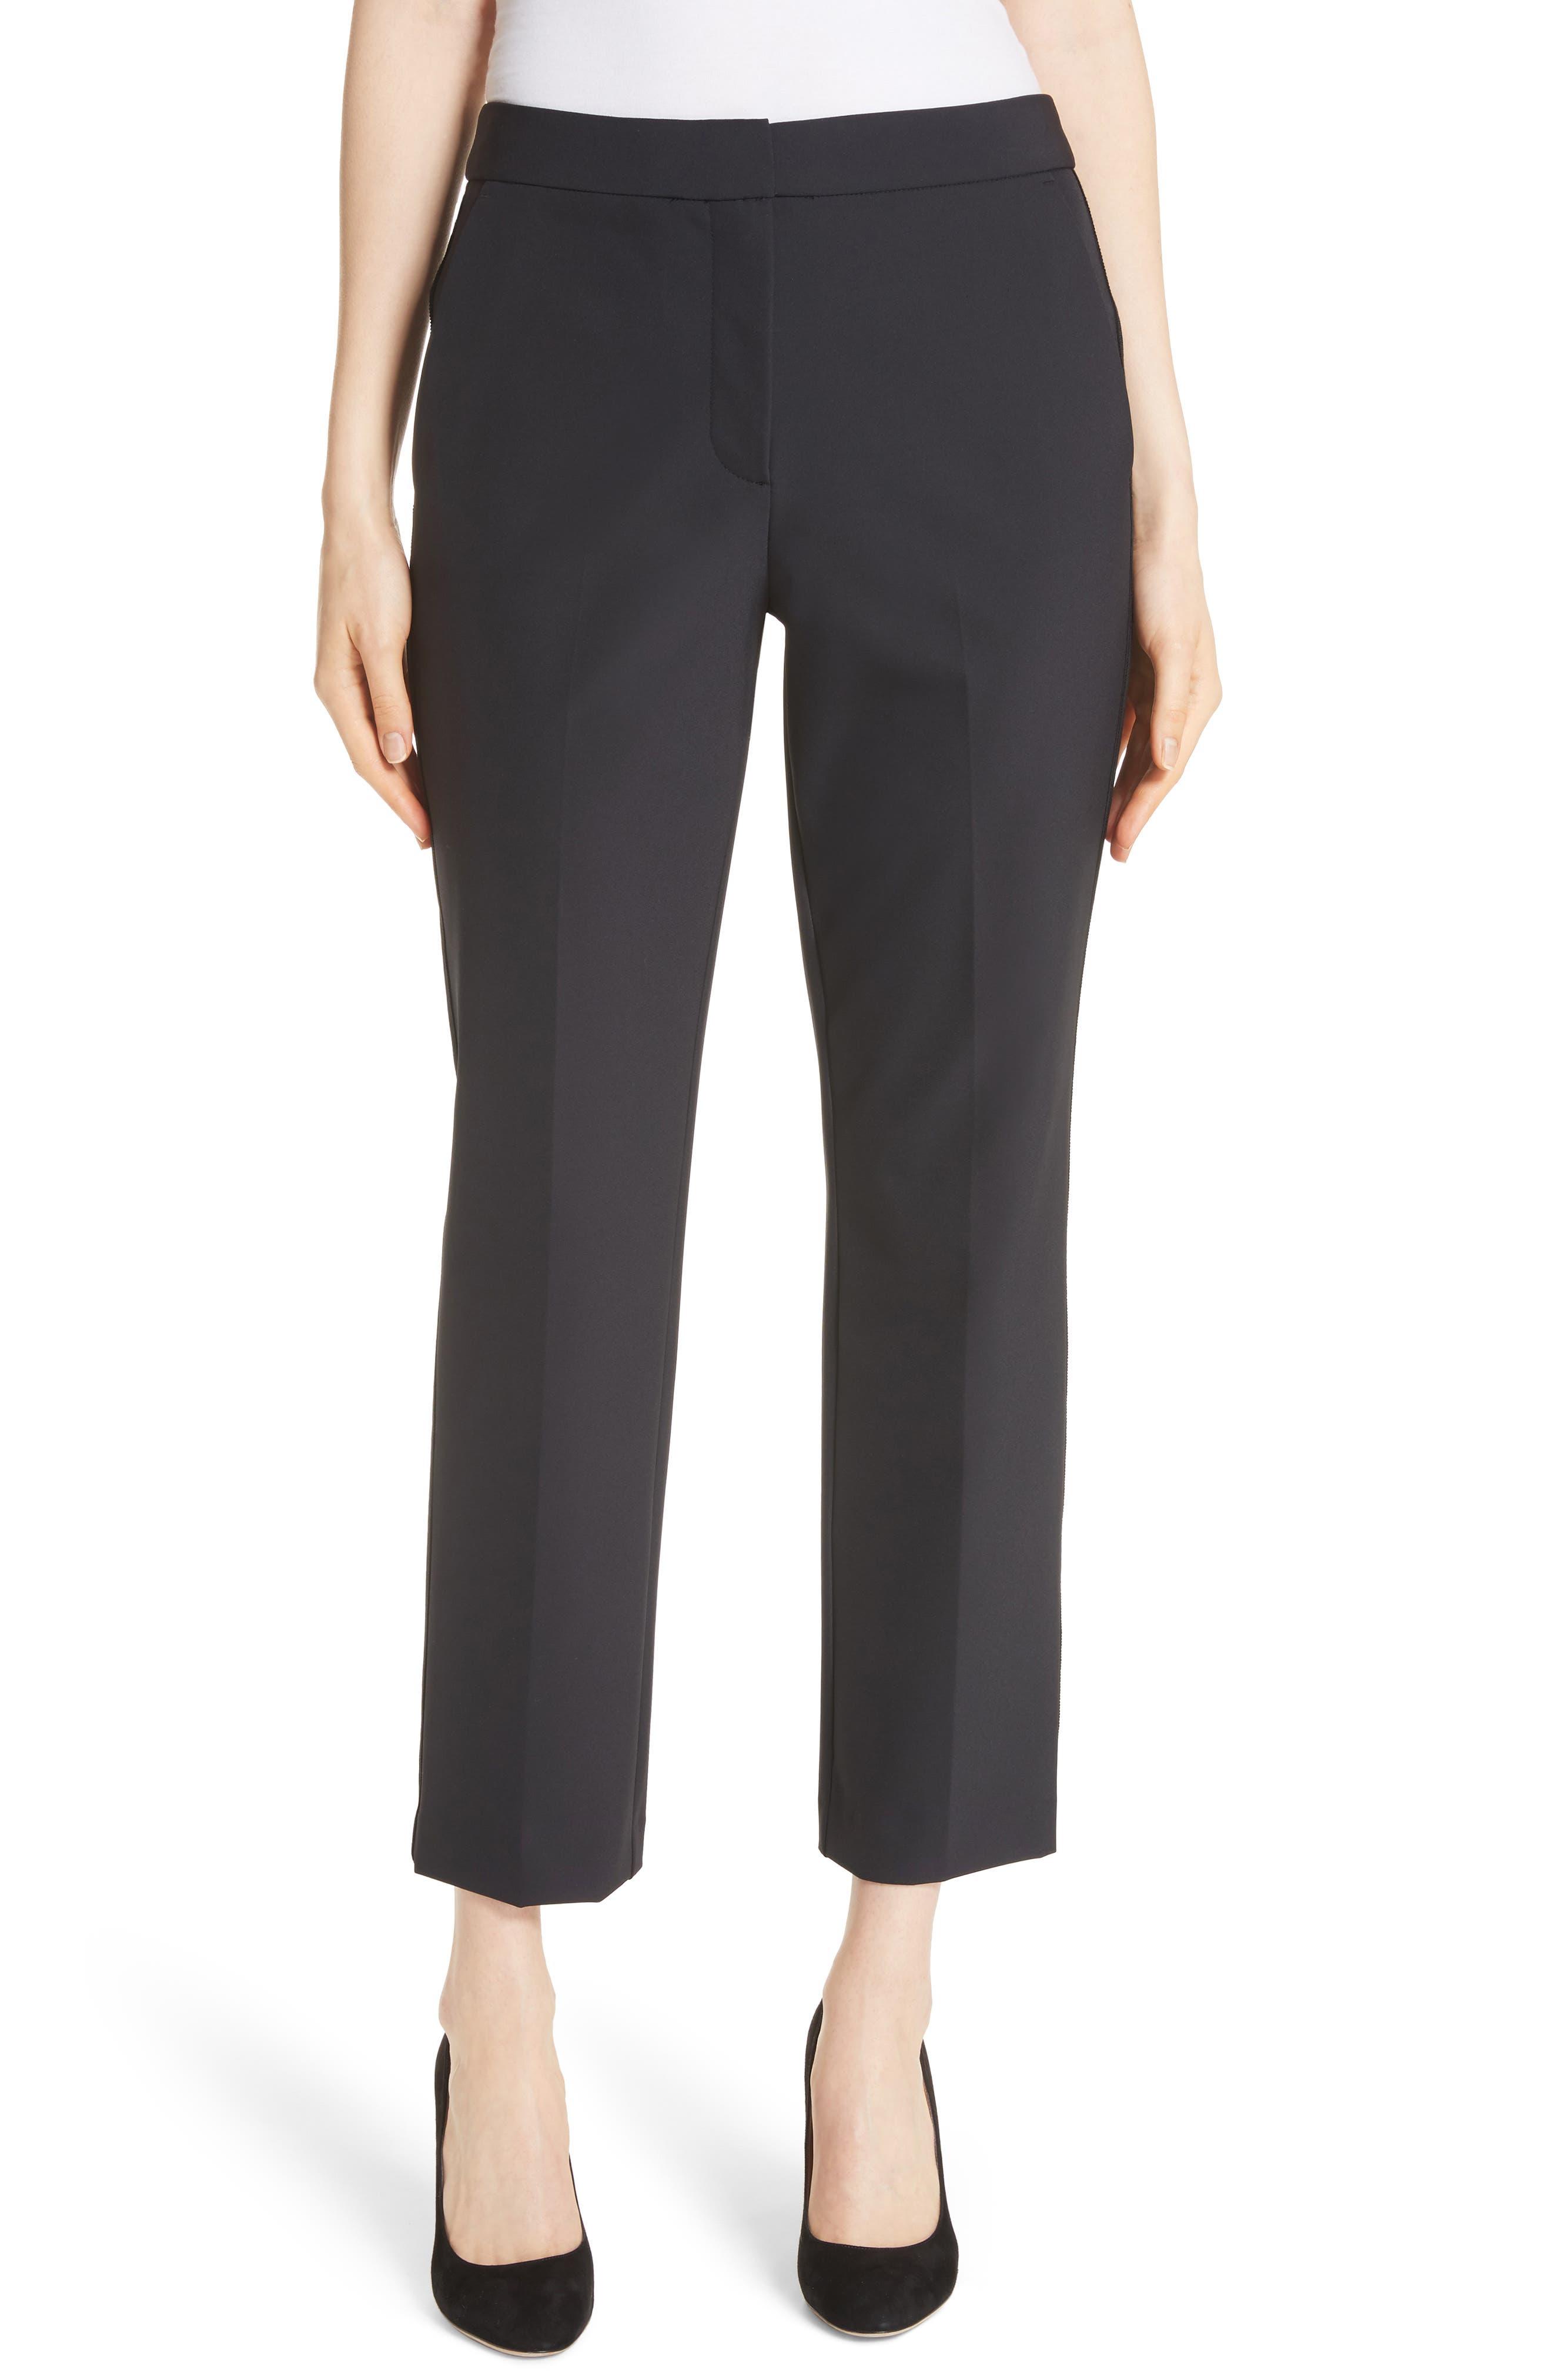 REBECCA TAYLOR Audra Crop Pants, Main, color, BLACK